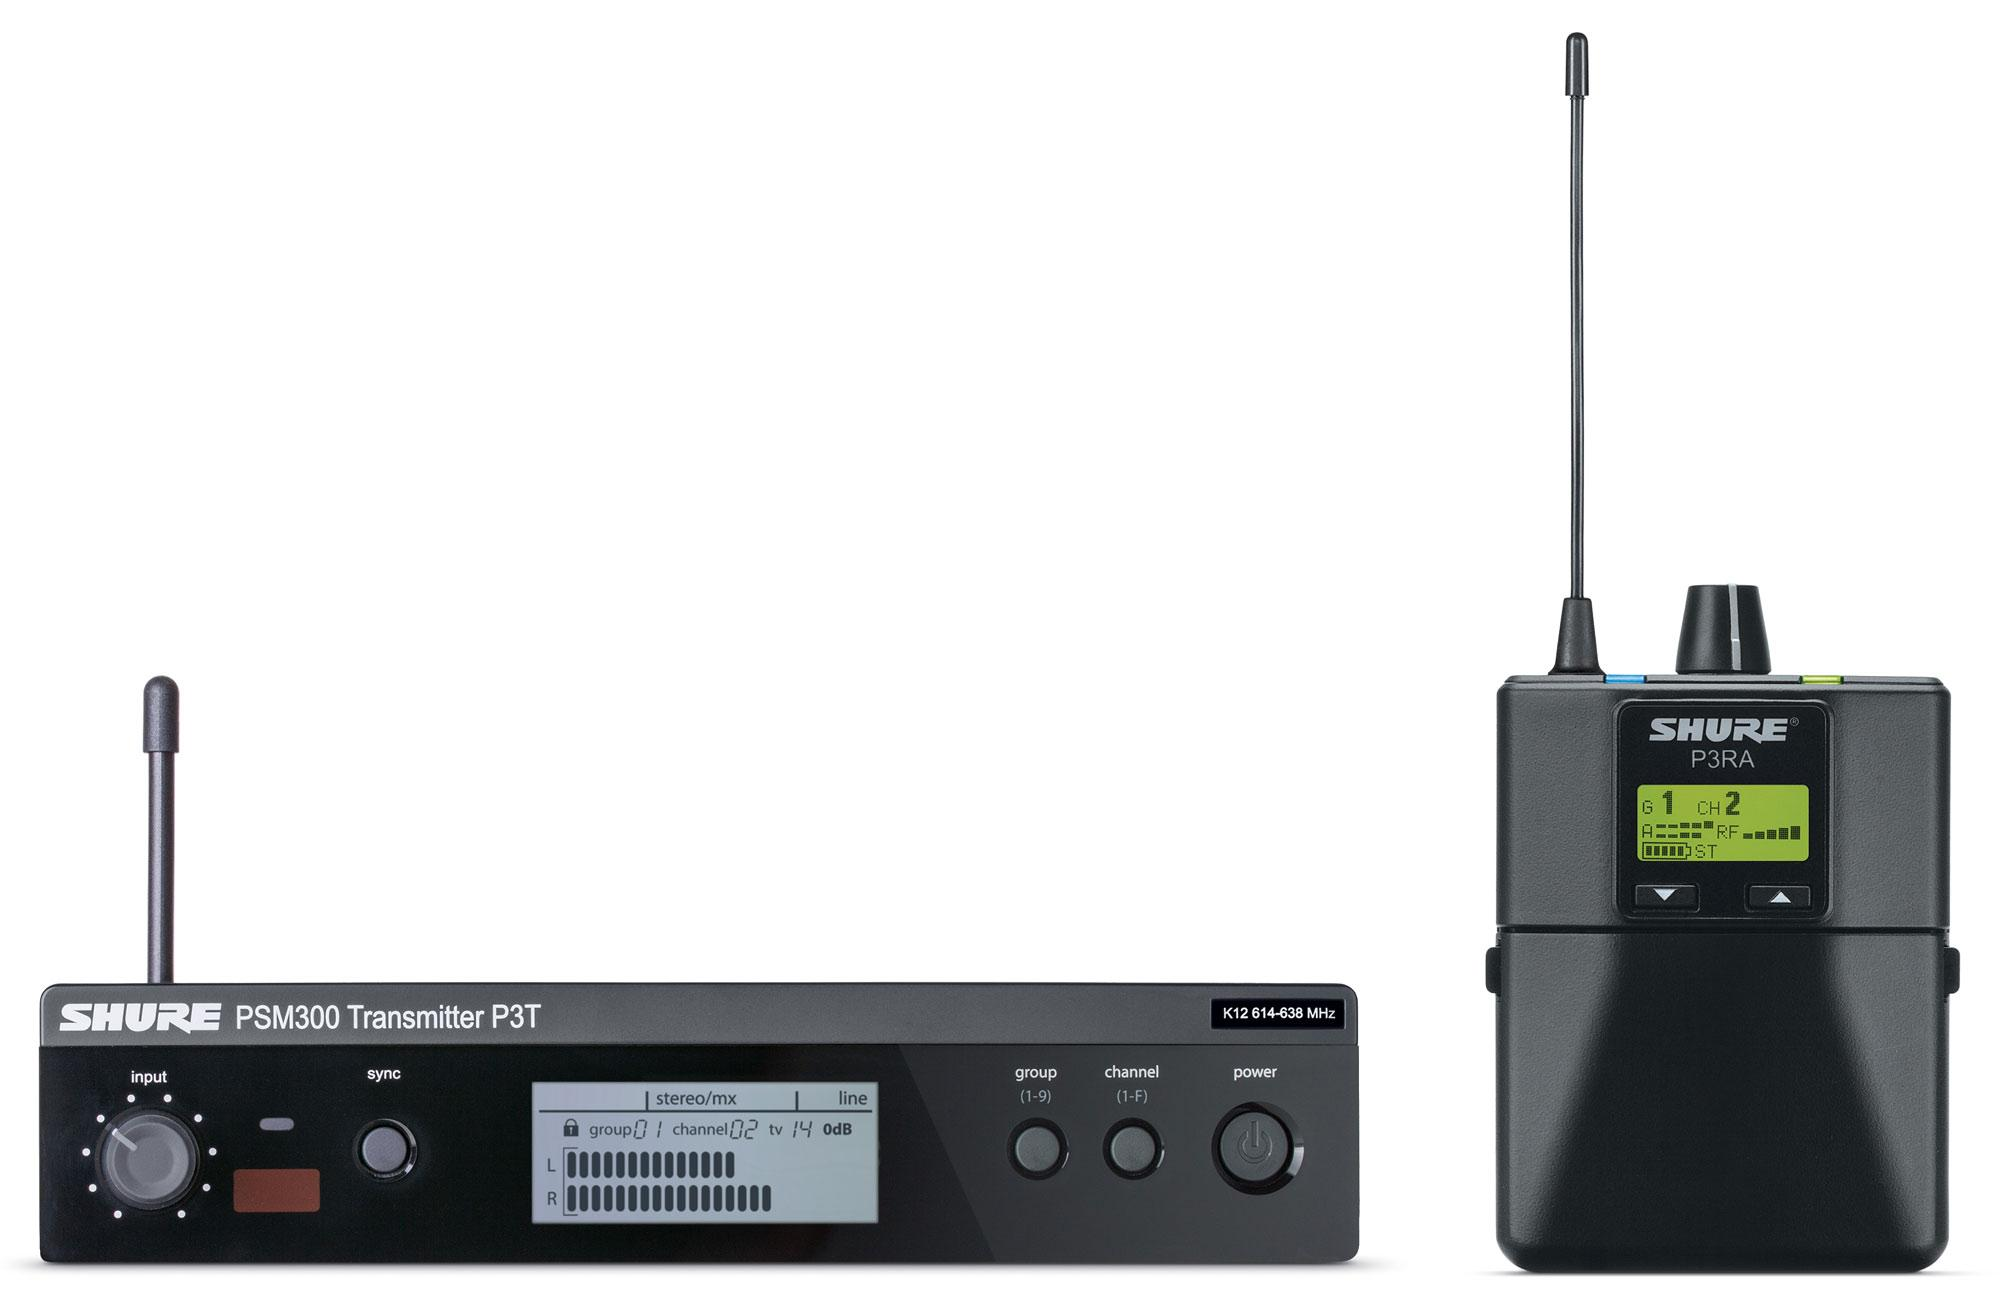 Drahtlossysteme - Shure PSM 300 Premium S8 In Ear Monitoring - Onlineshop Musikhaus Kirstein